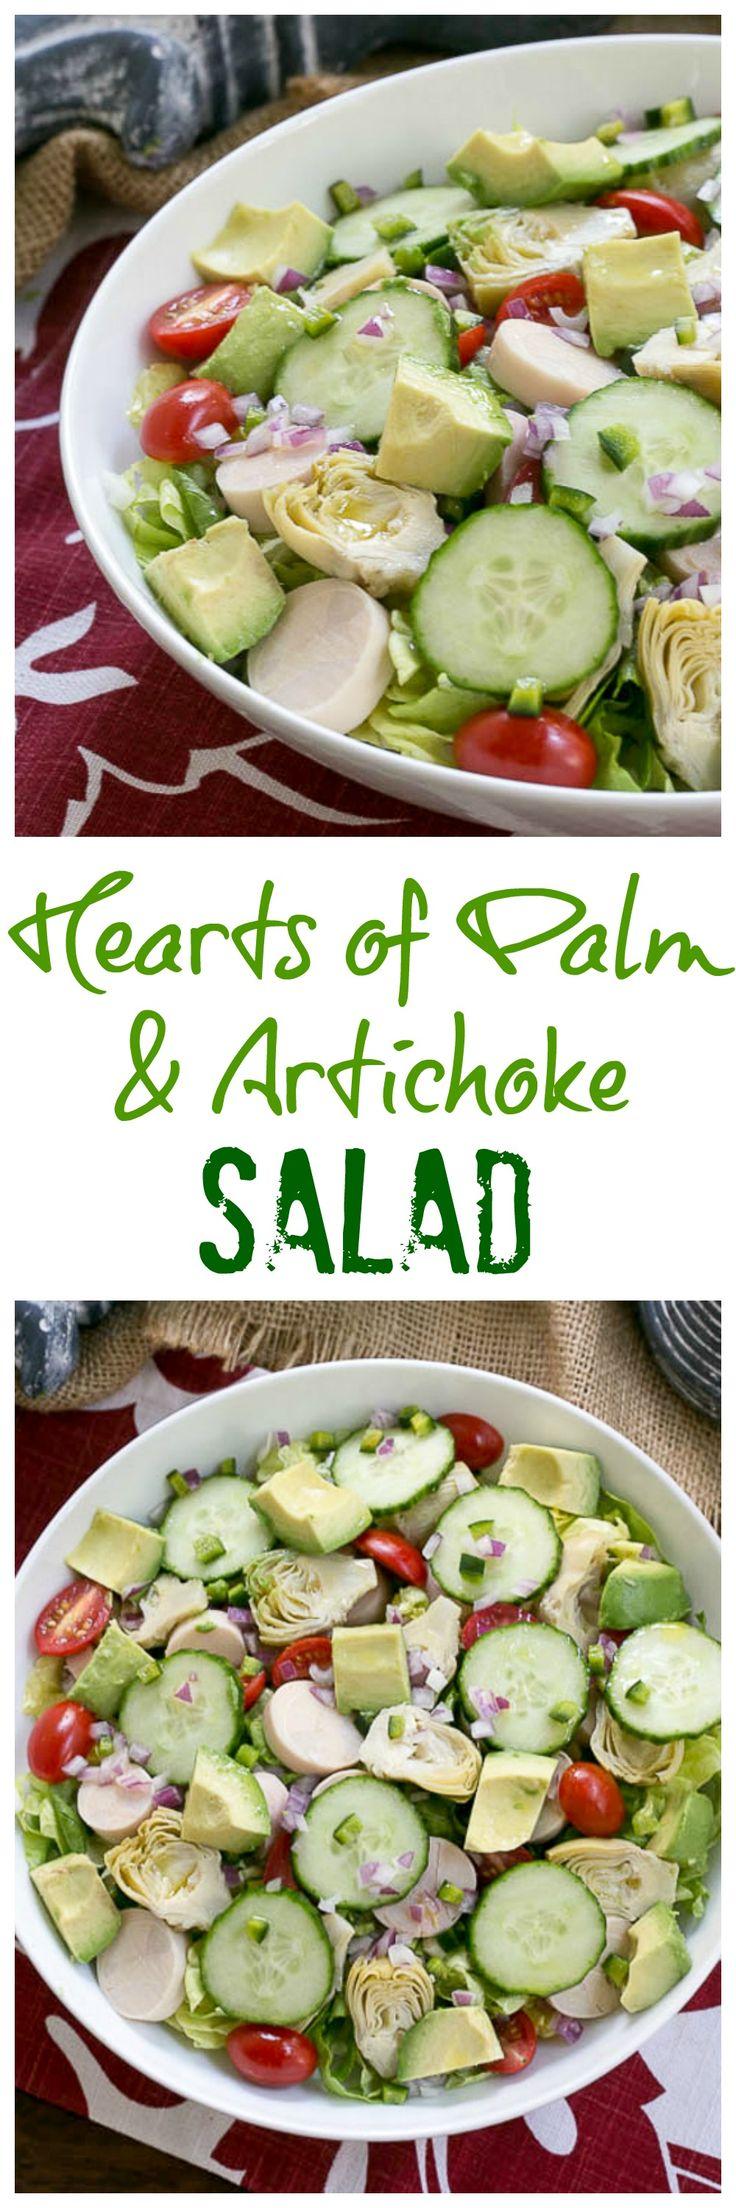 Hearts of Palm, Artichoke, Avocado and Butter Lettuce Salad @lizzydo